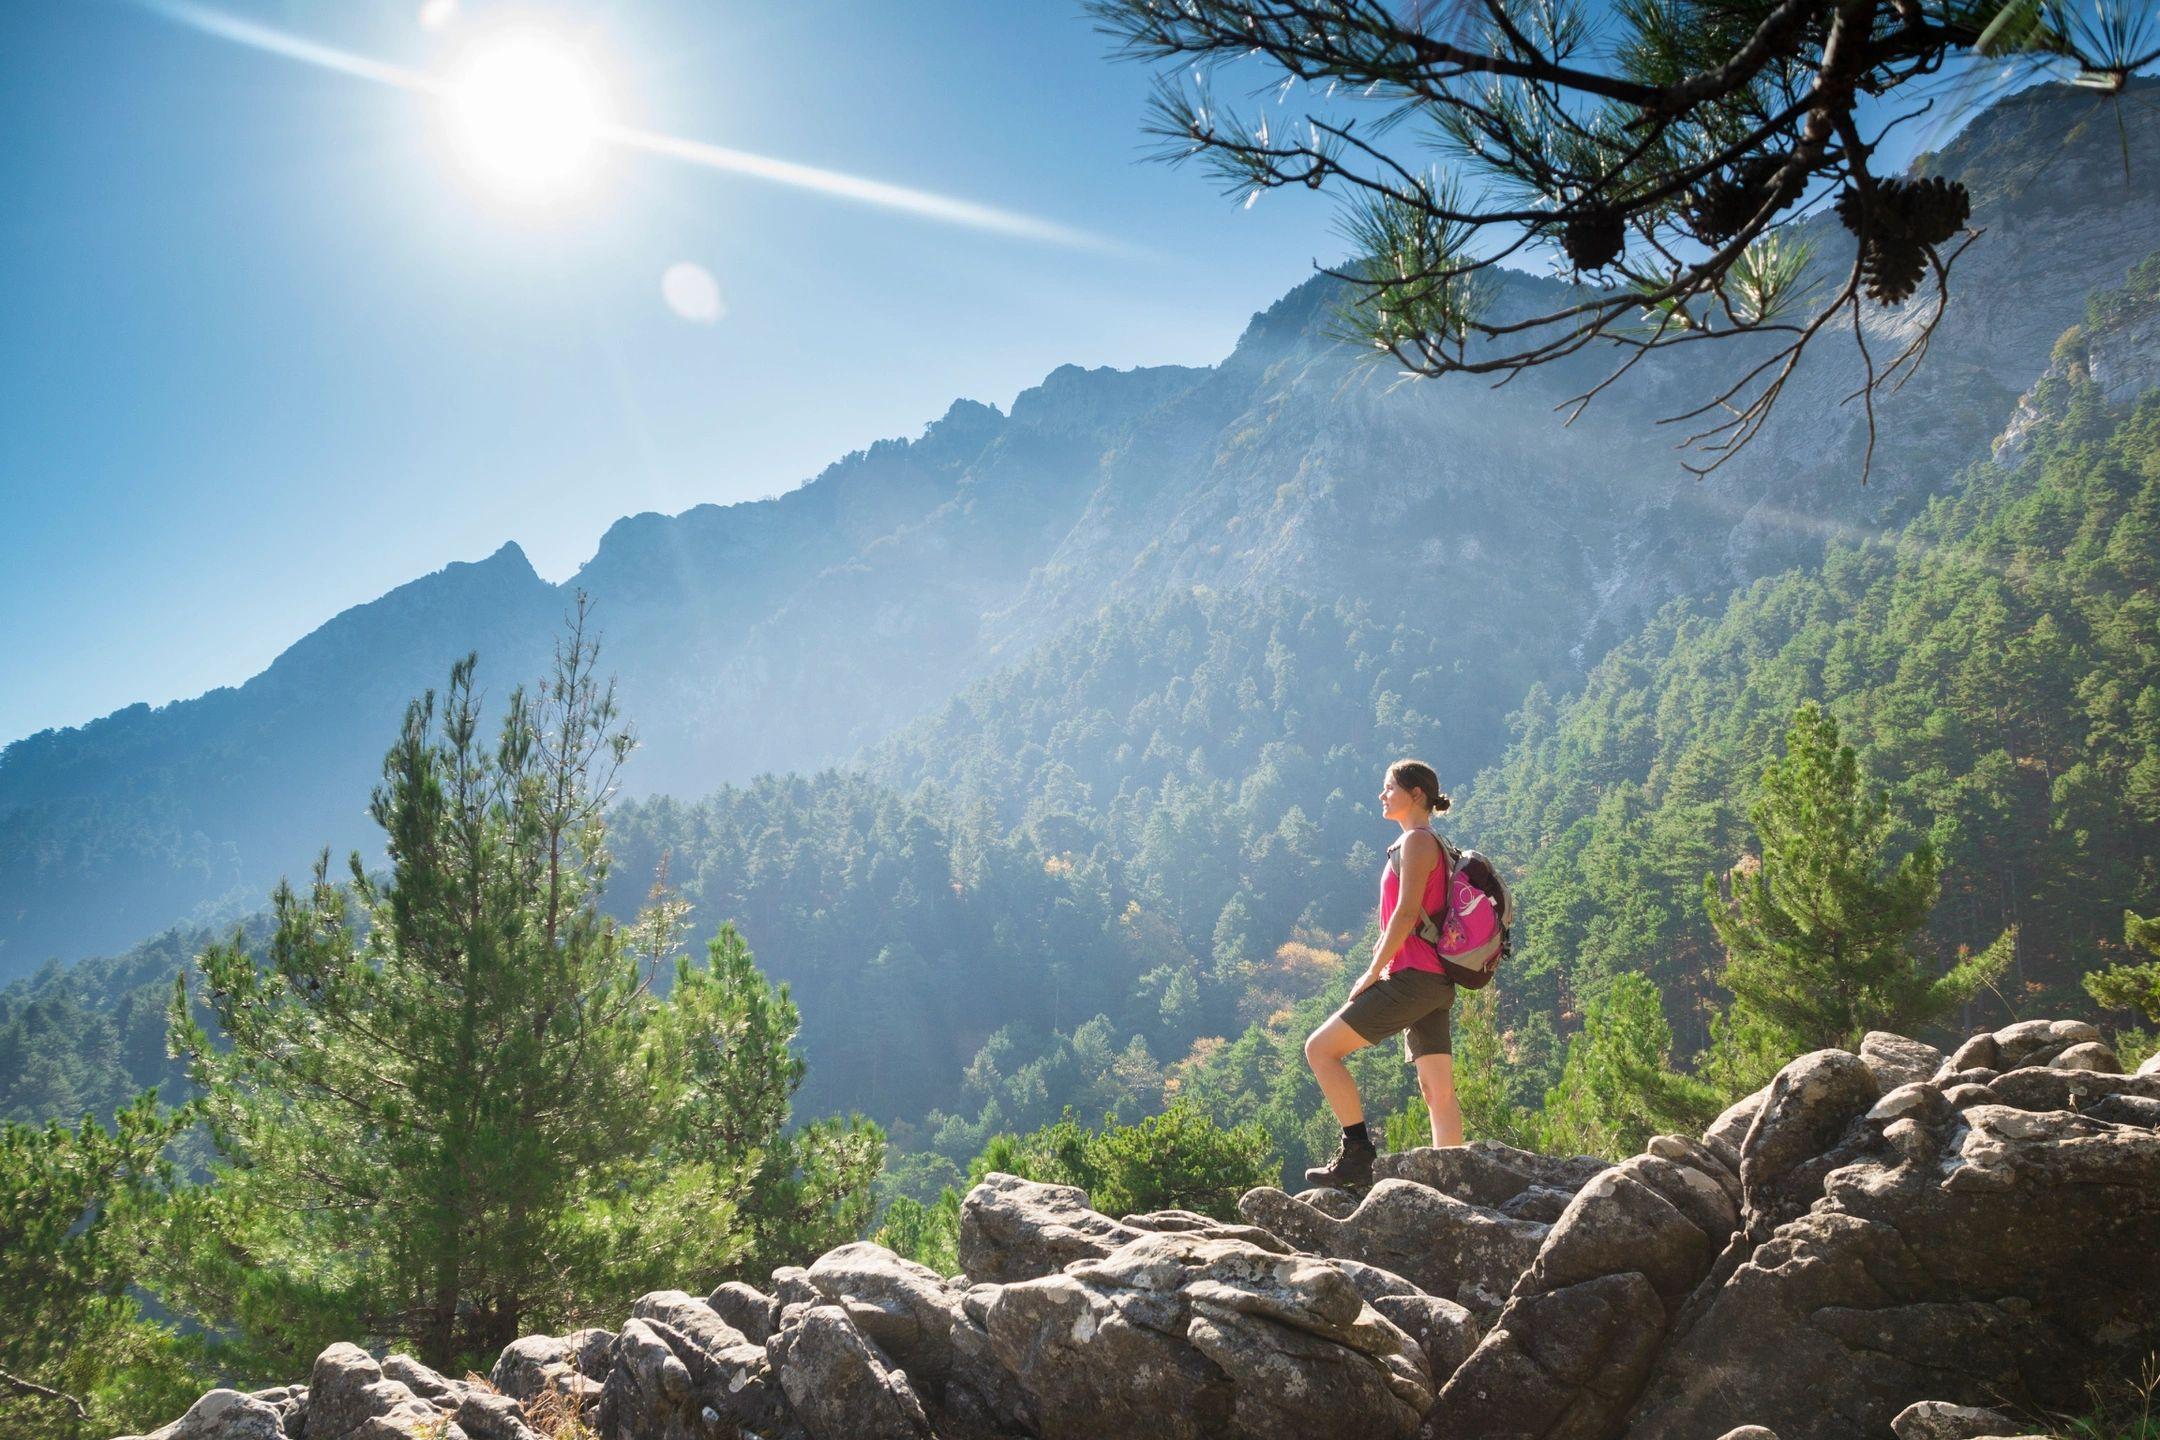 a hiker enjoying the great outdoors